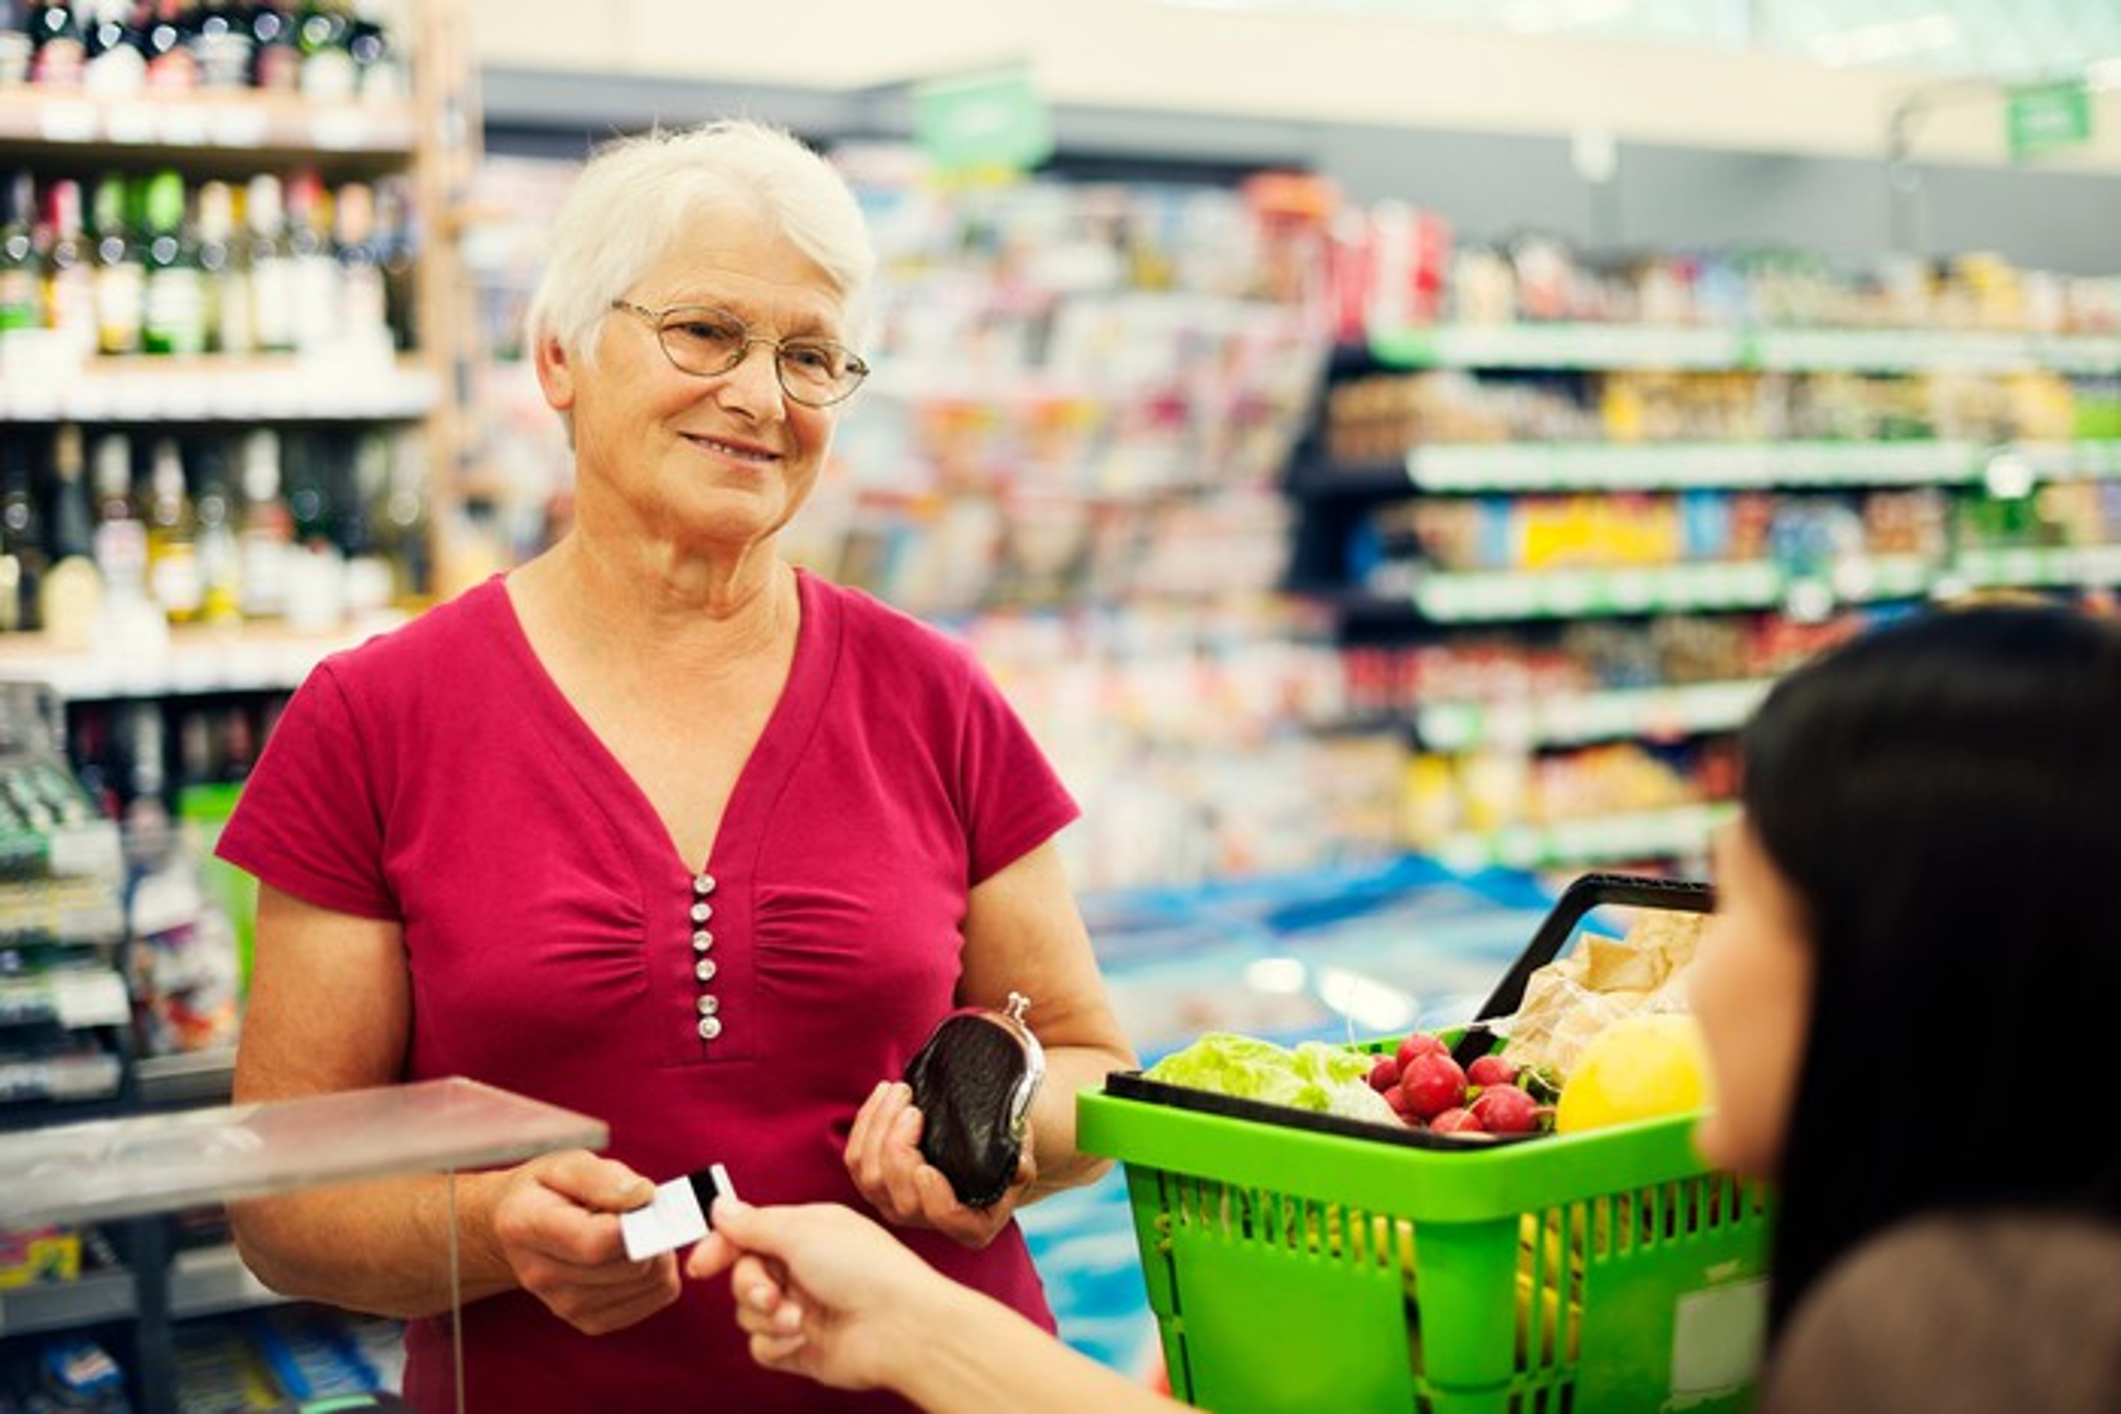 A senior women buying groceries.